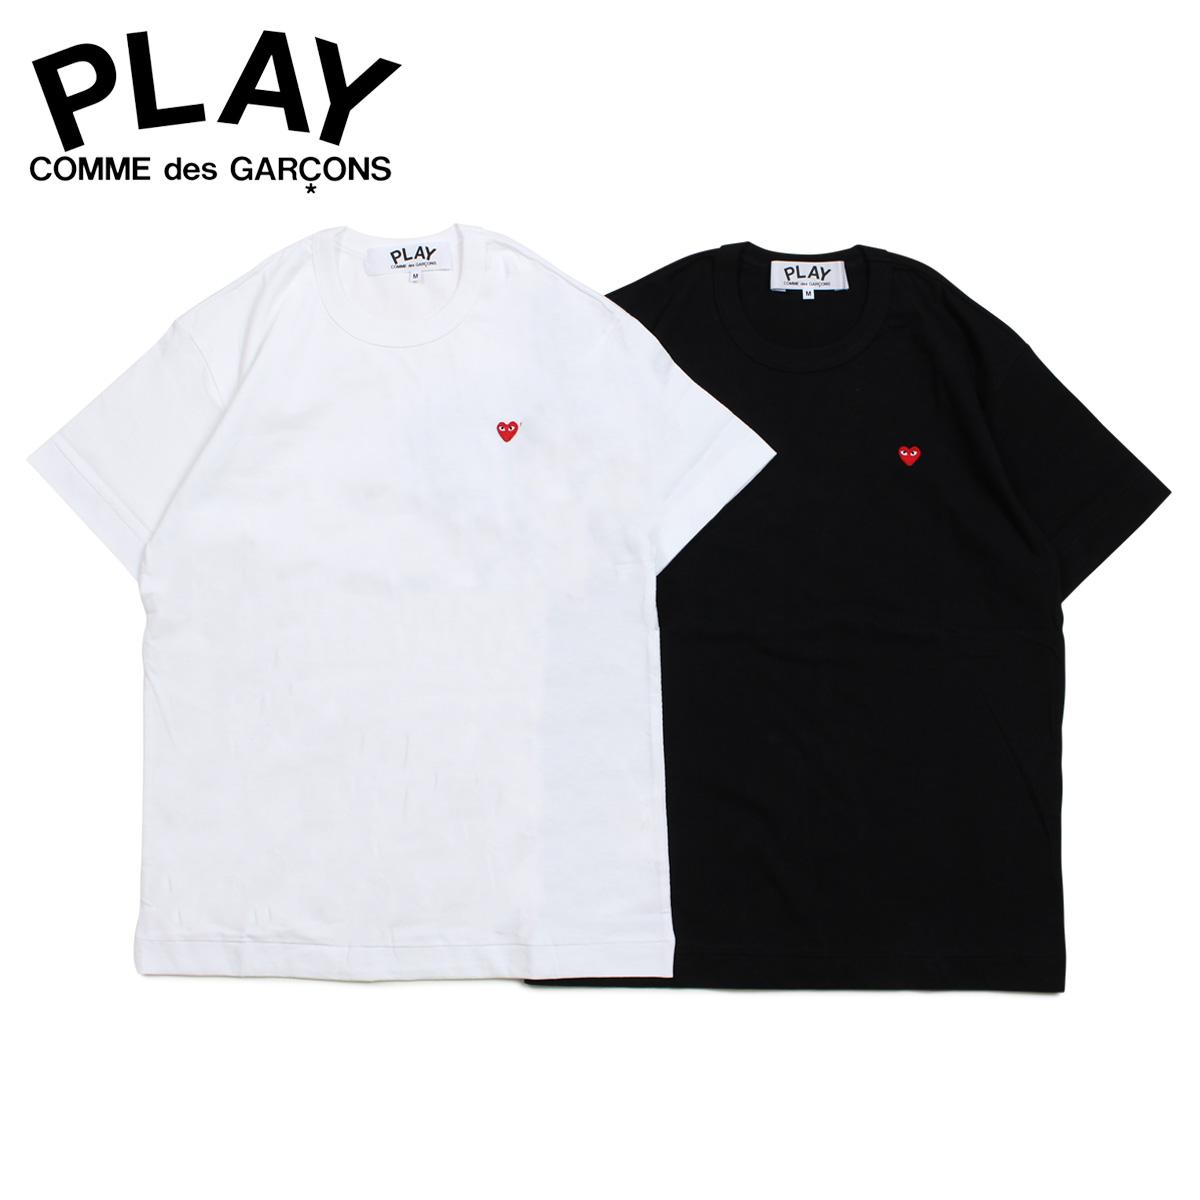 481fab0f PLAY COMME des GARCONS LITTLE RED HEART T-SHIRT コムデギャルソン T-shirt men short  ...